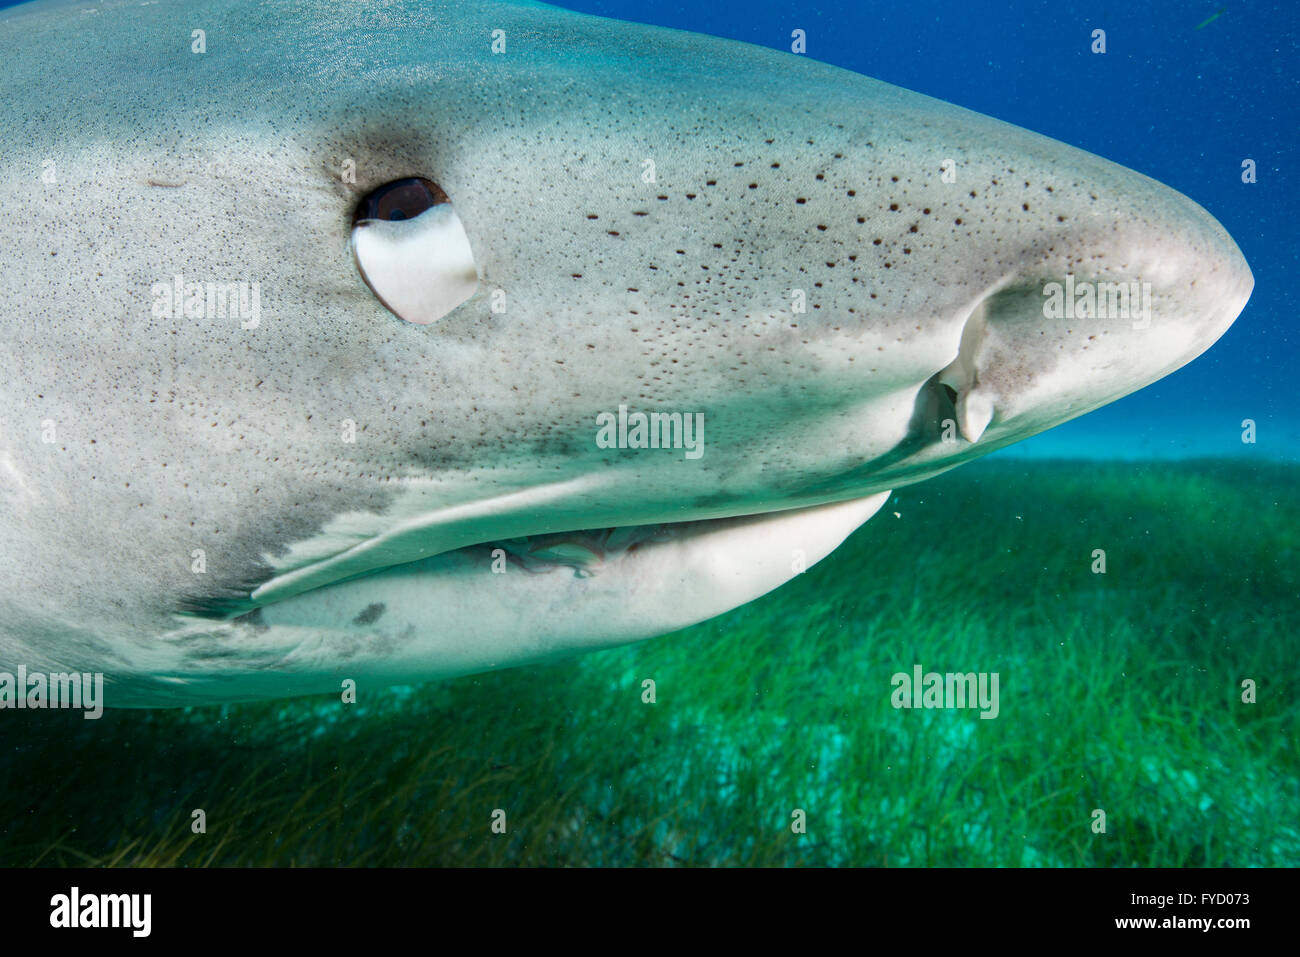 Tiger shark, Galeocerdo cuvier, side portrait, Bahamas - Stock Image